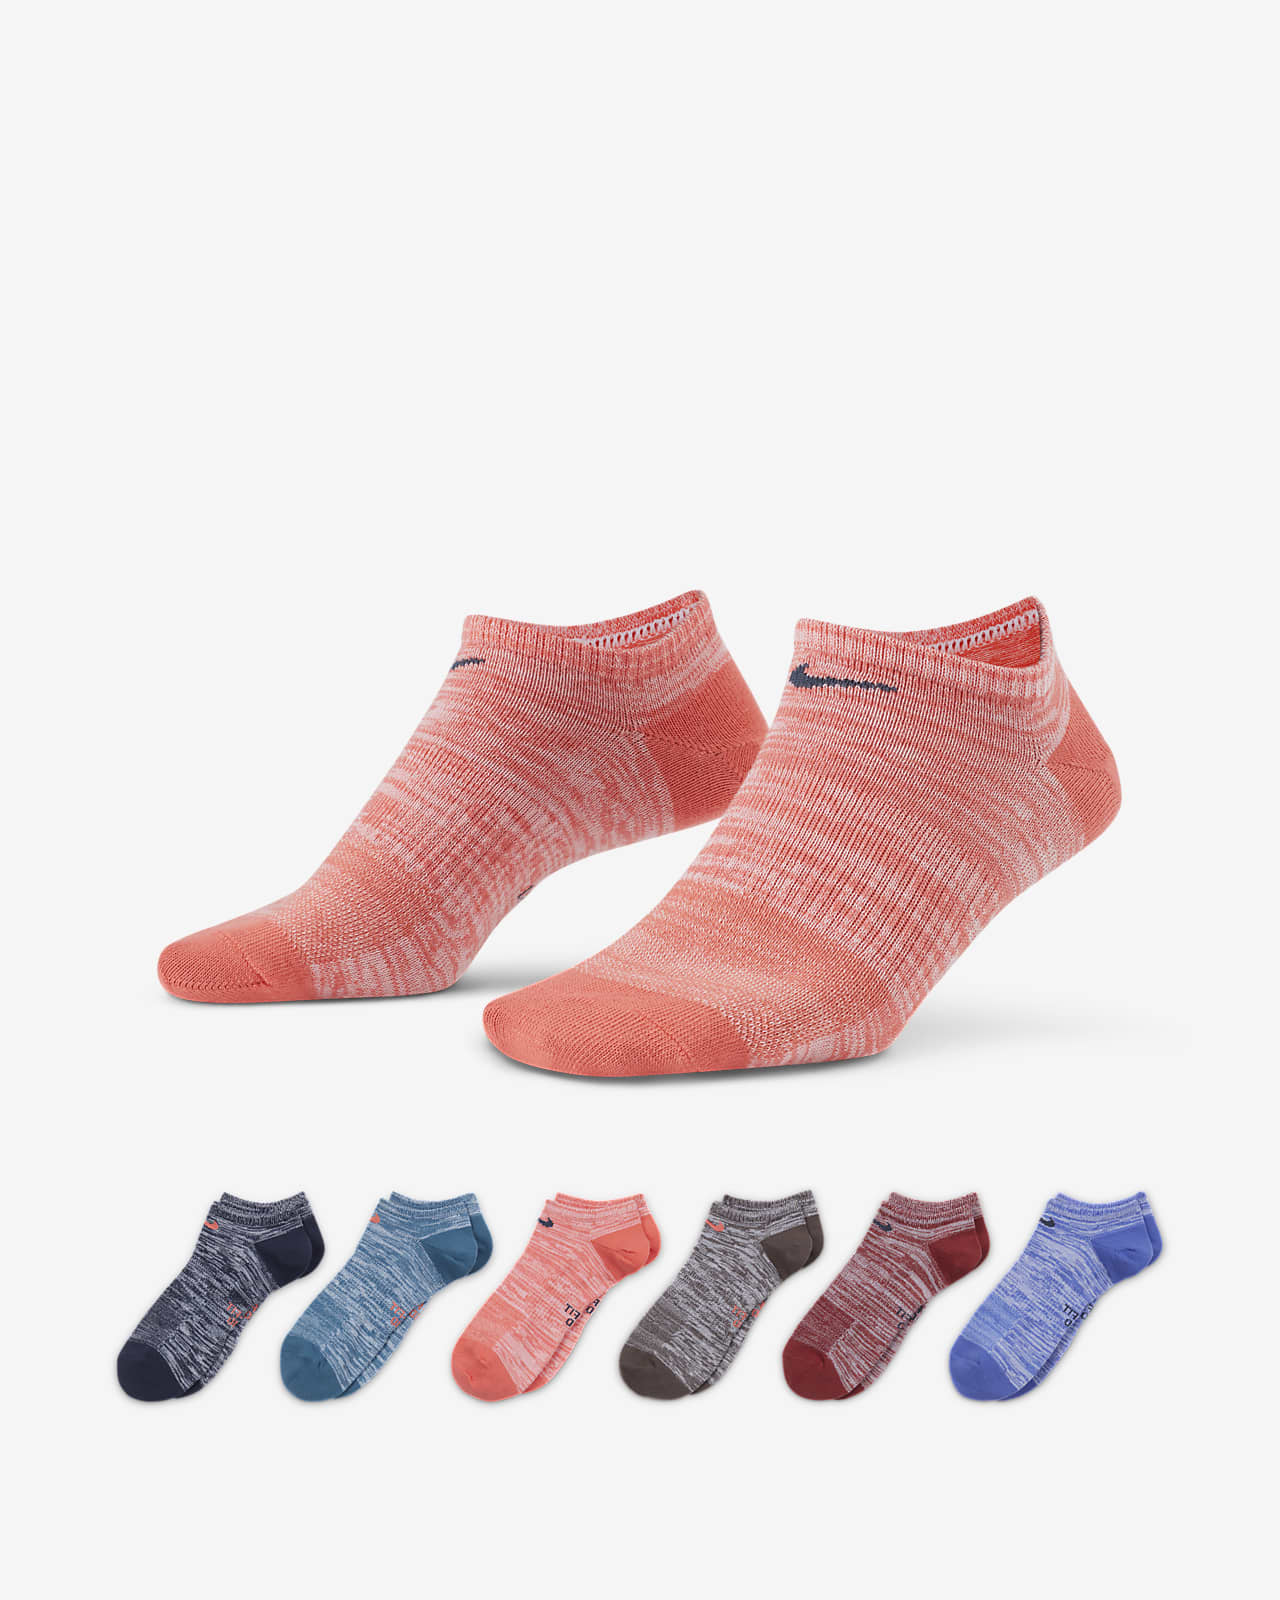 Calcetines de entrenamiento para mujer Nike Everyday Lightweight No-Show (6 pares)